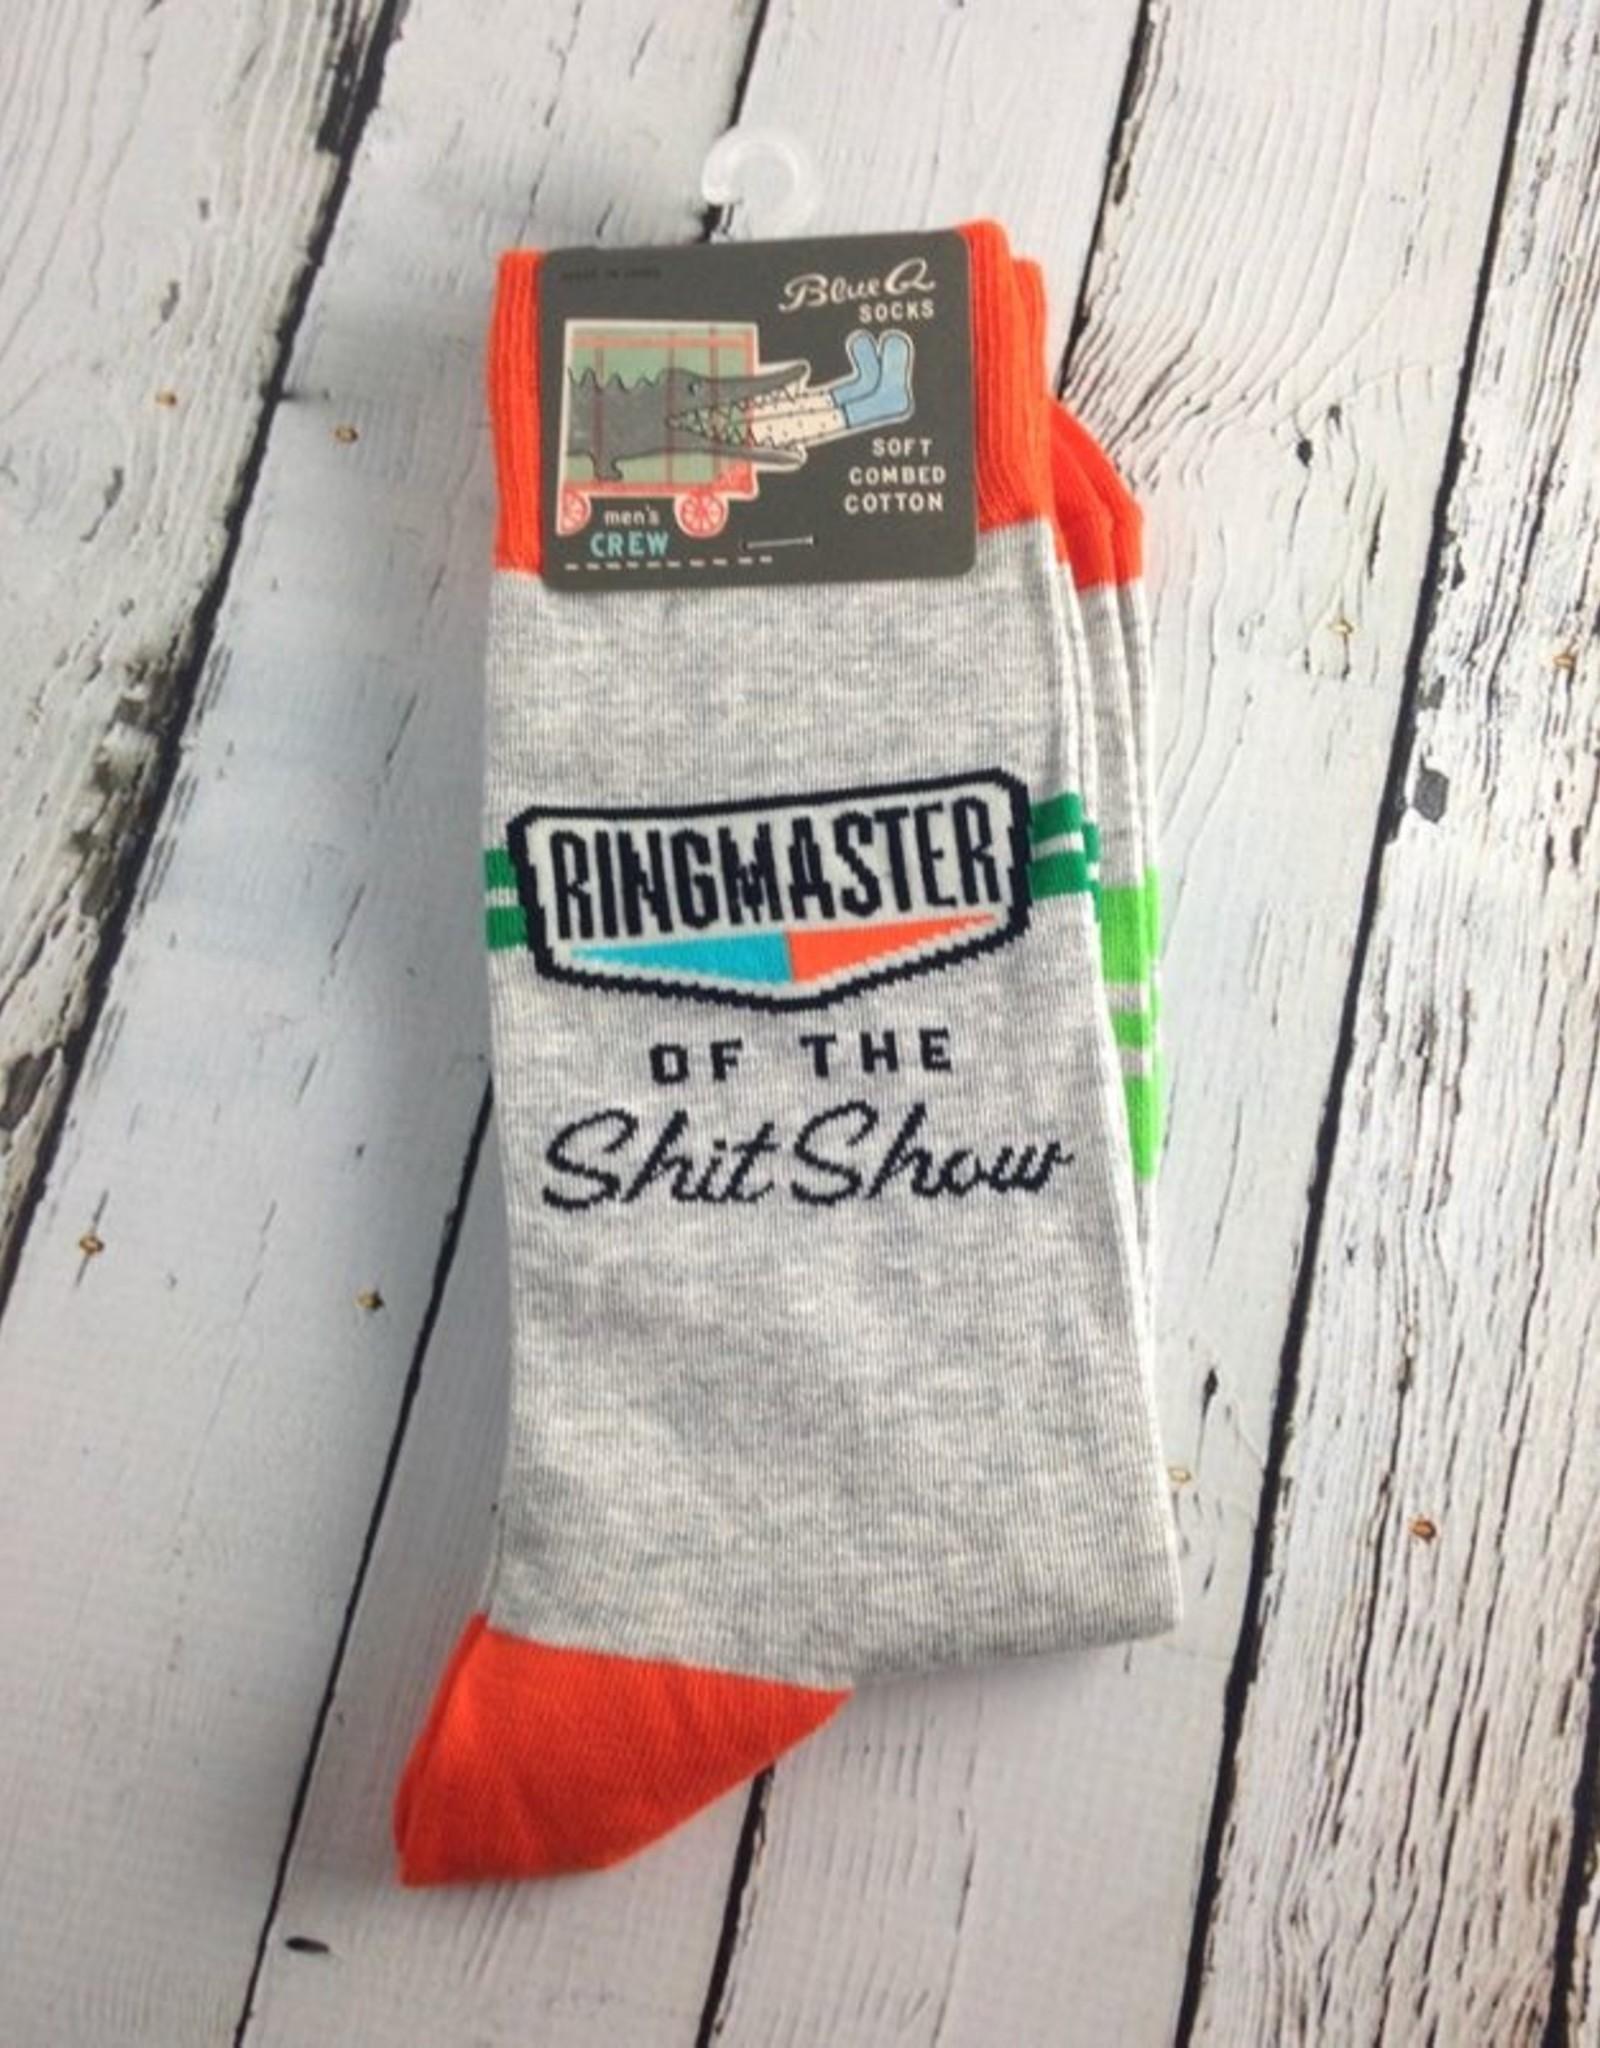 BlueQ Ringmaster of the Shitshow Men's Socks